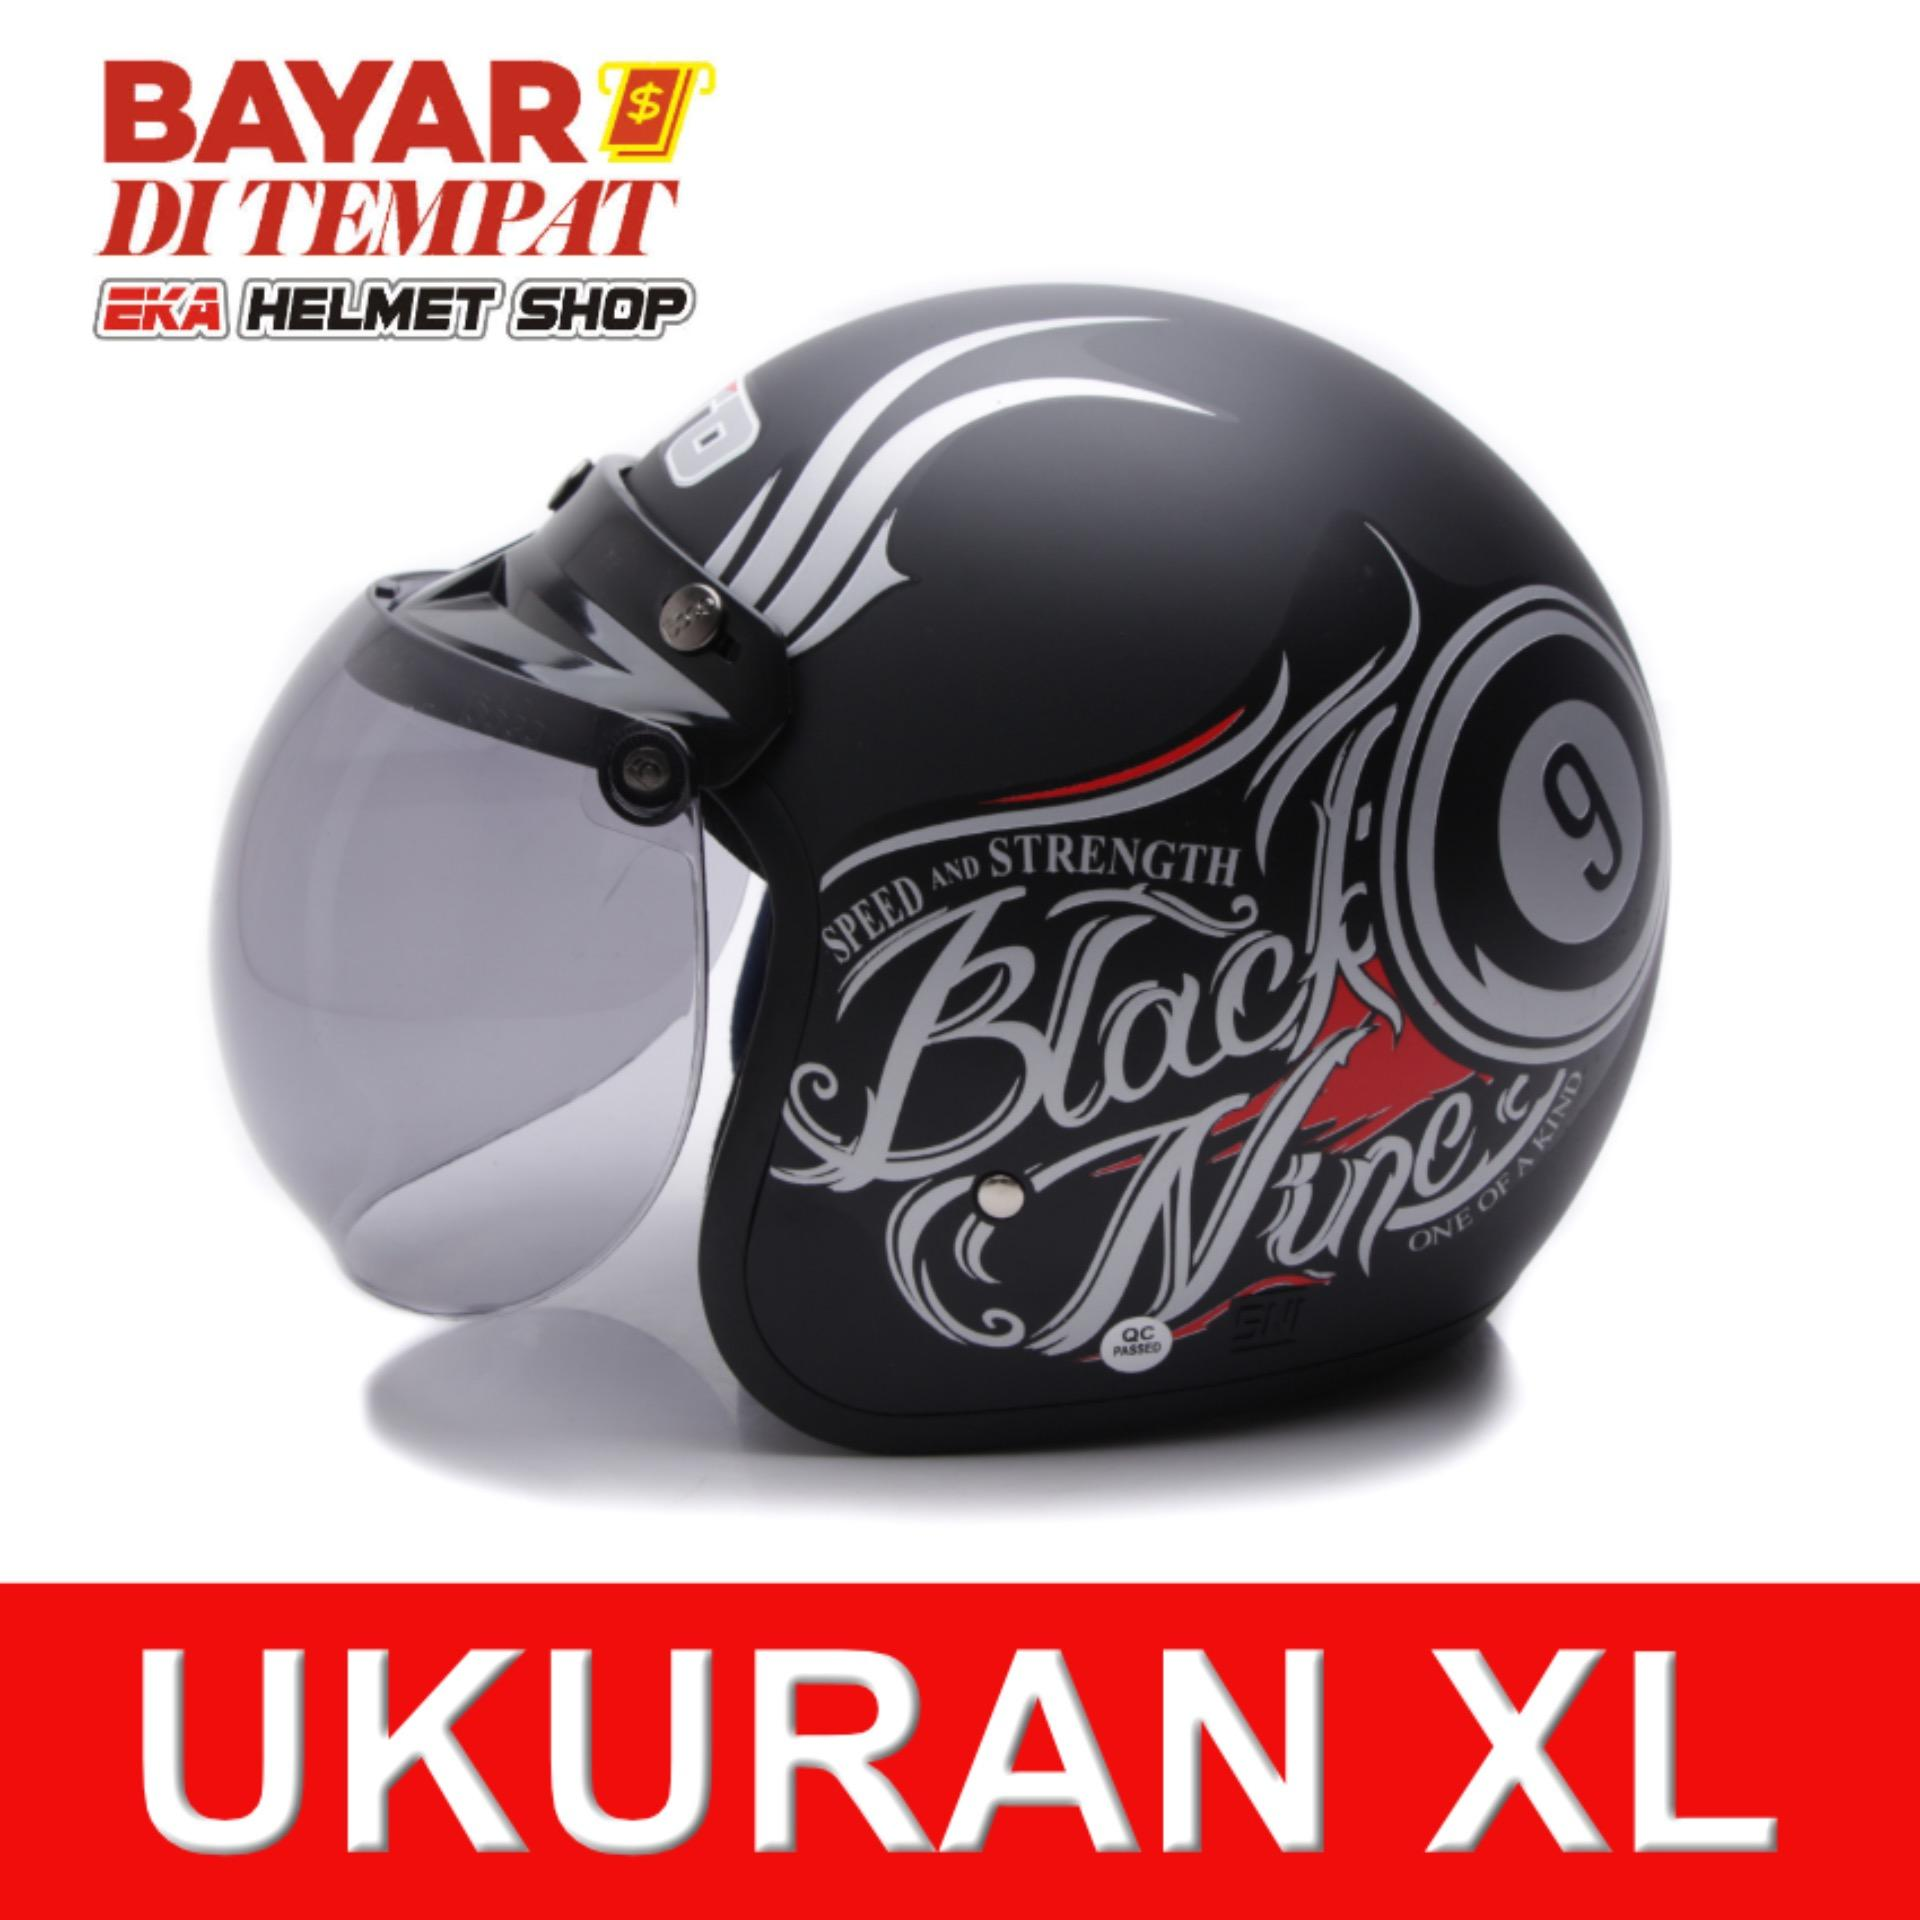 Jual Wto Helmet Retro Bogo Black Nine Hitam Doff